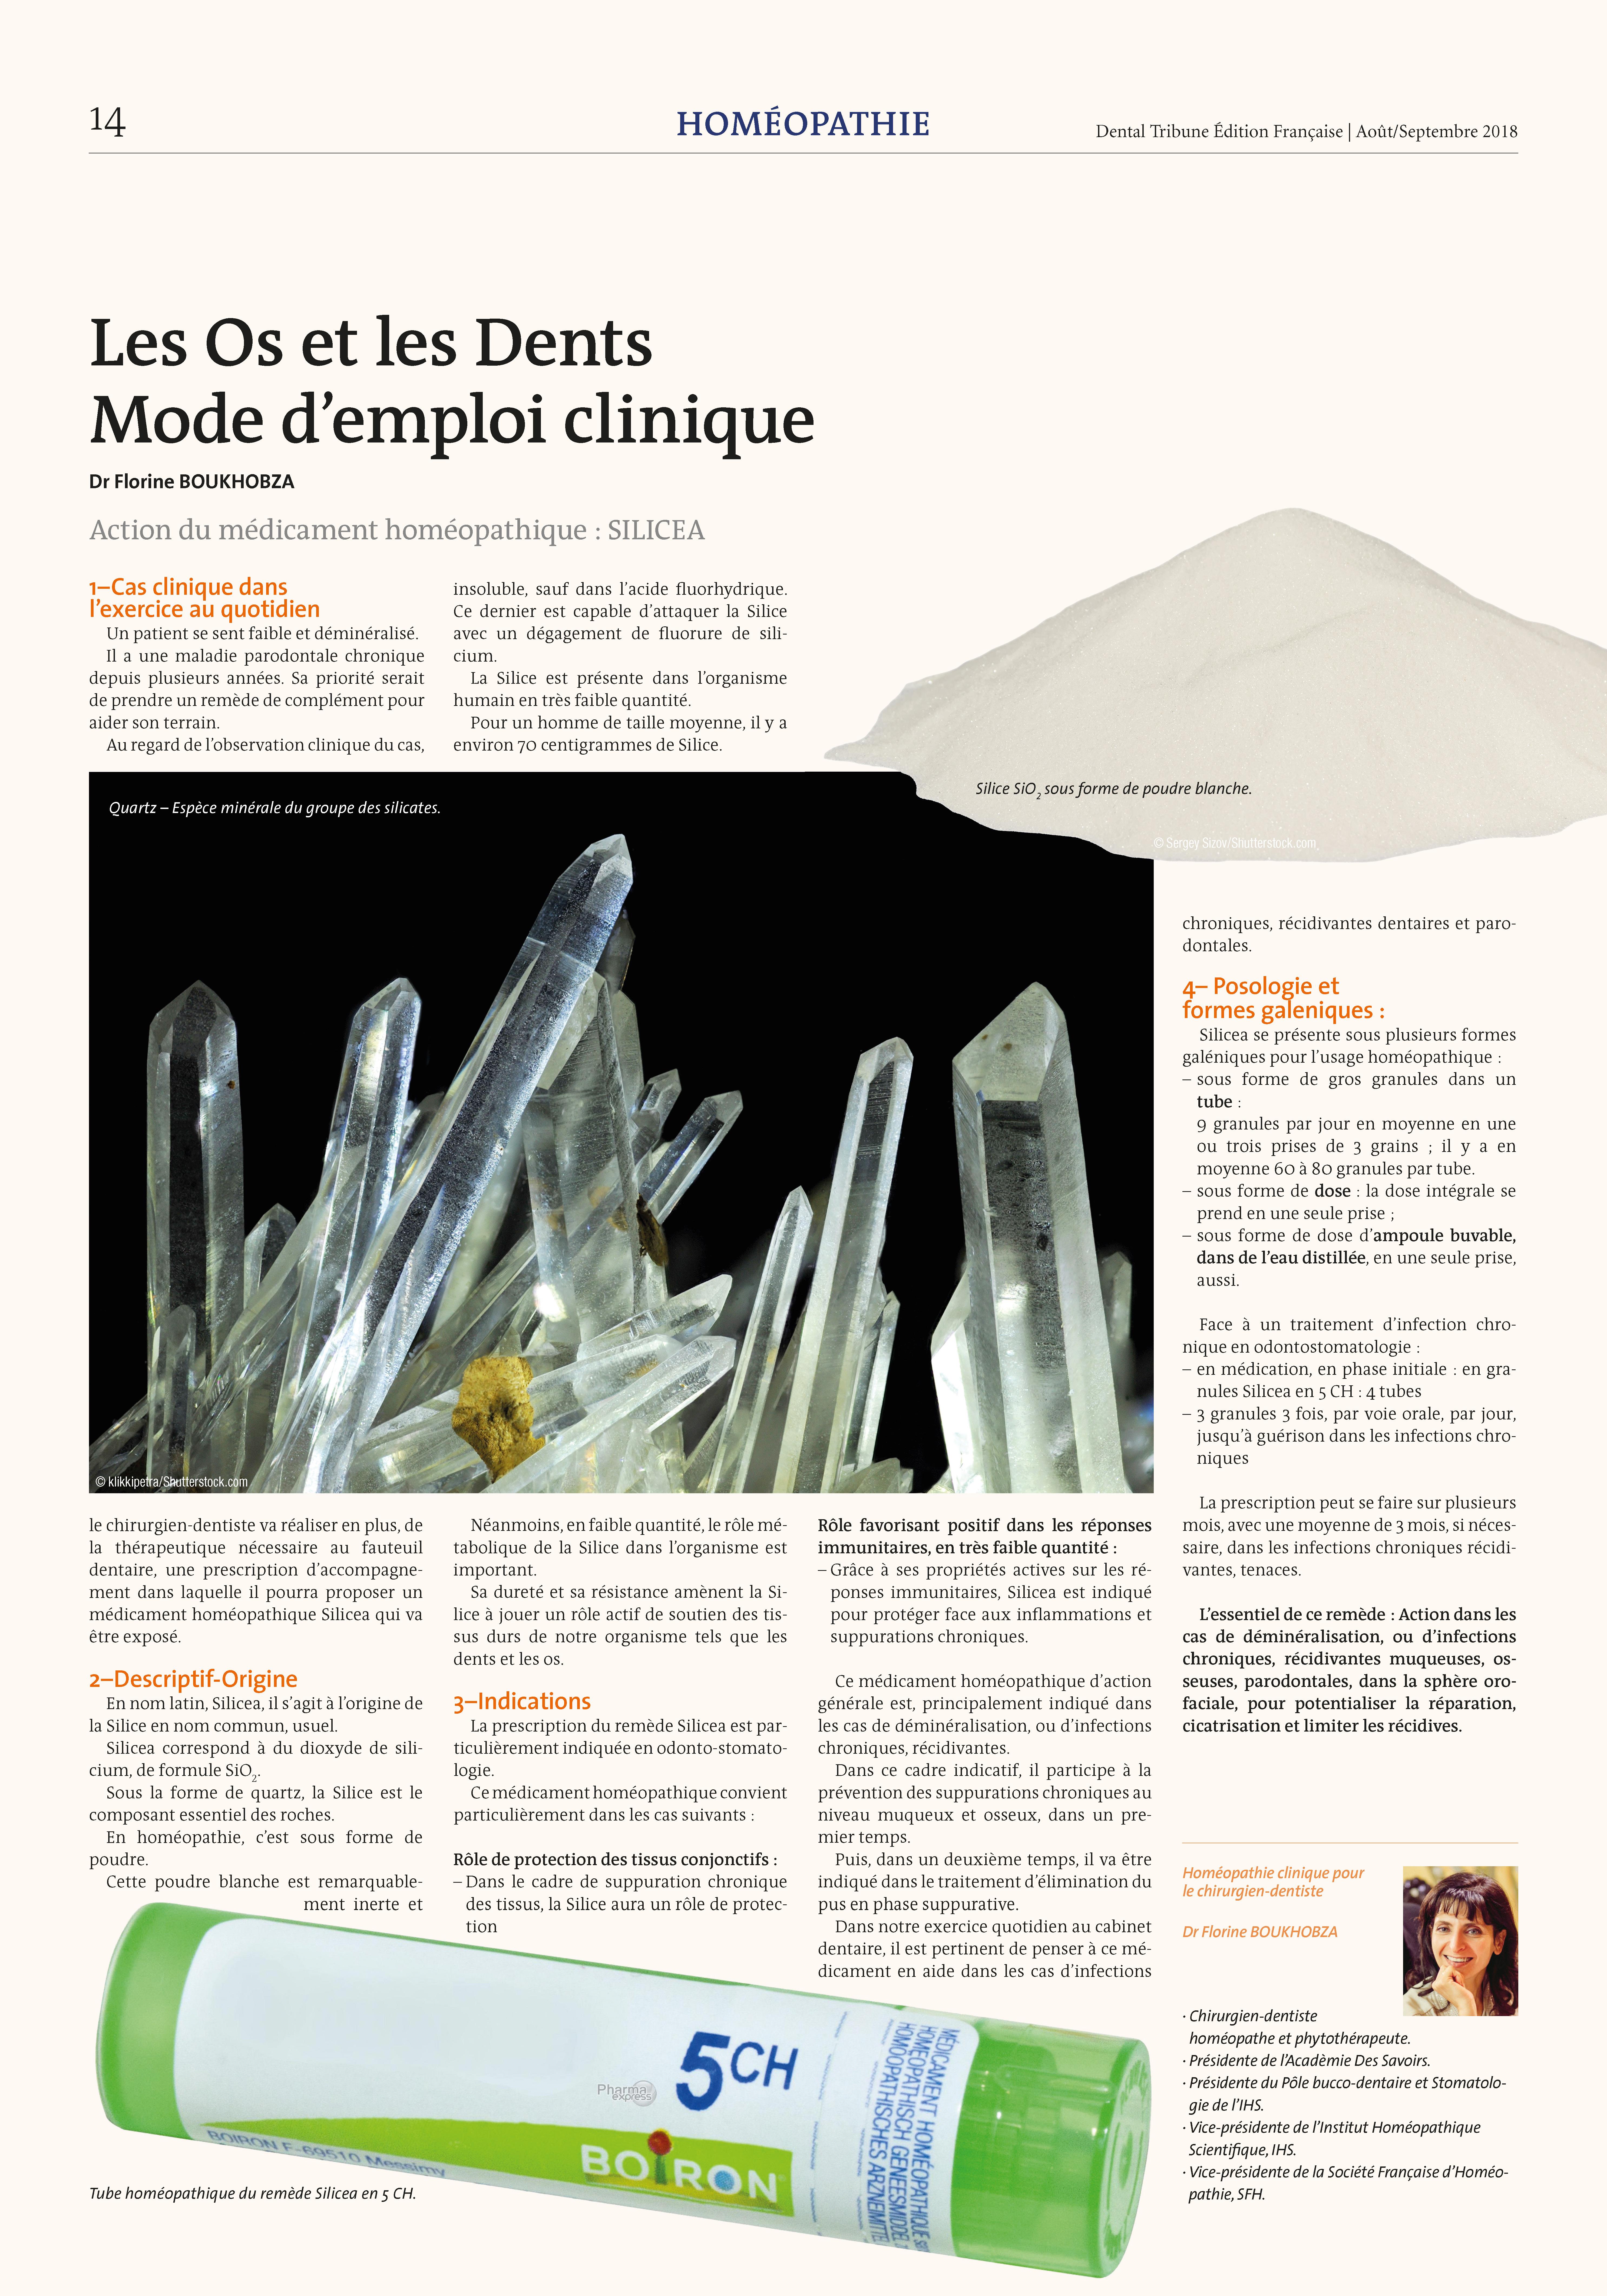 Homeopathie-Silicéa-art-jpg Dental tribune